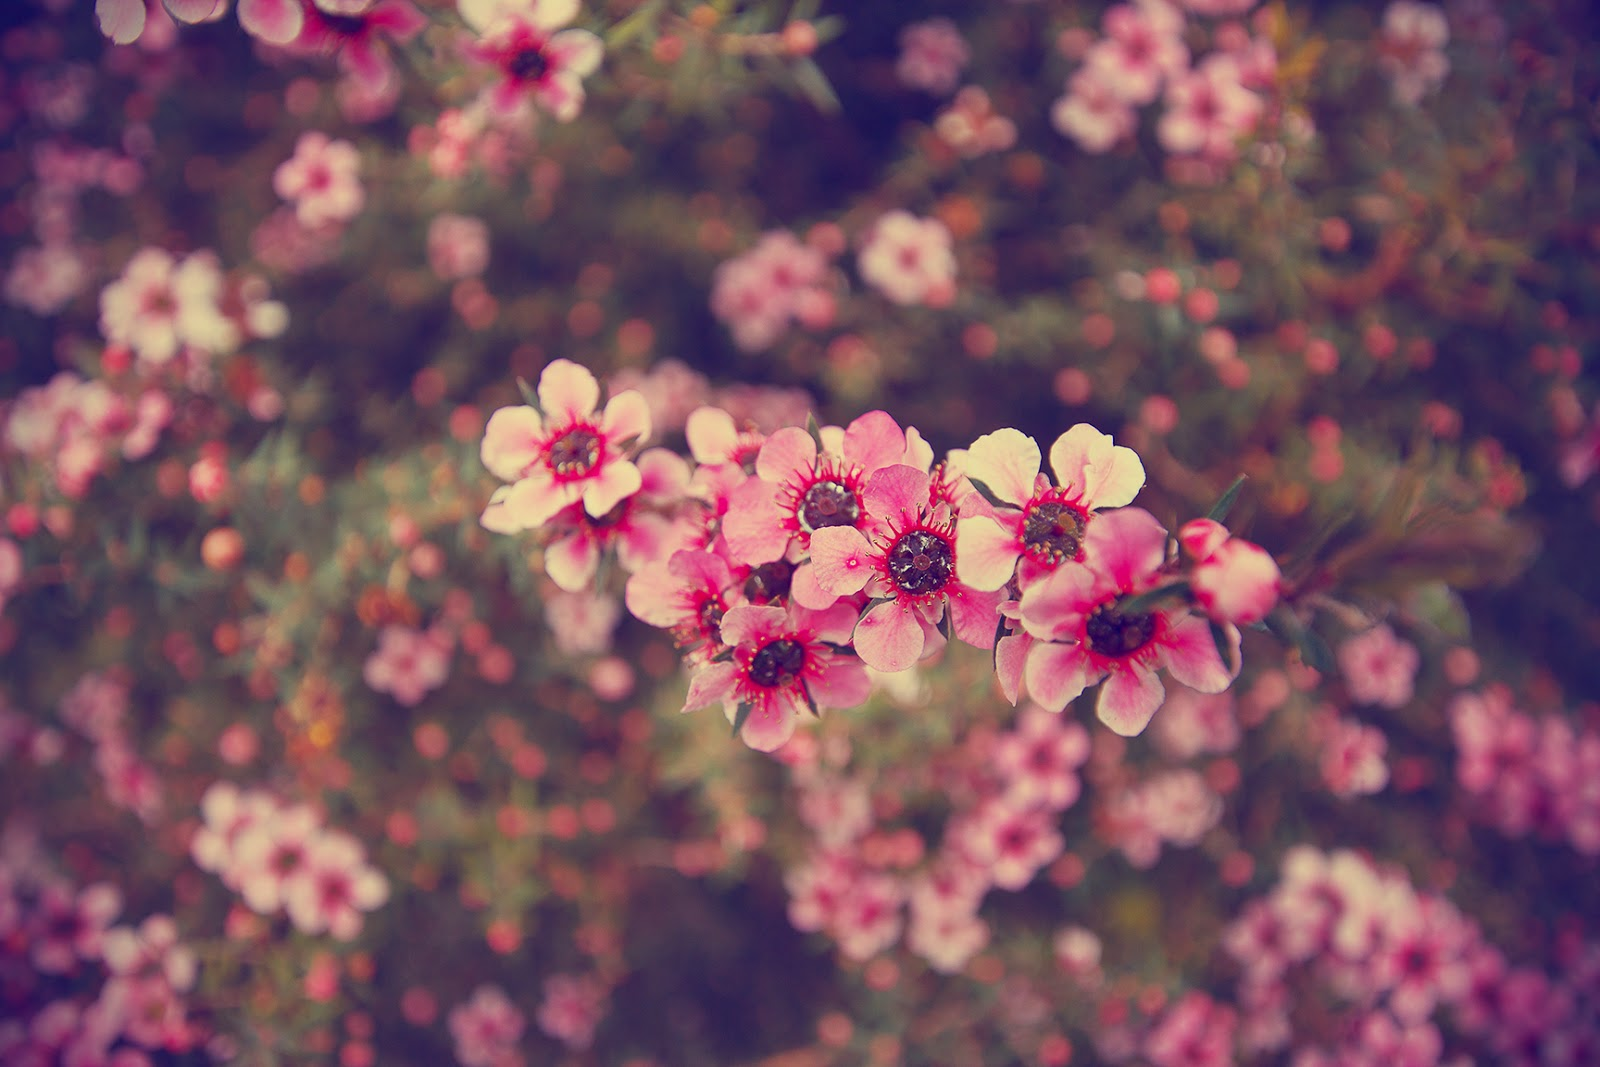 Wallpaper flower tumblr new top artists 2018 top artists 2018 mightylinksfo